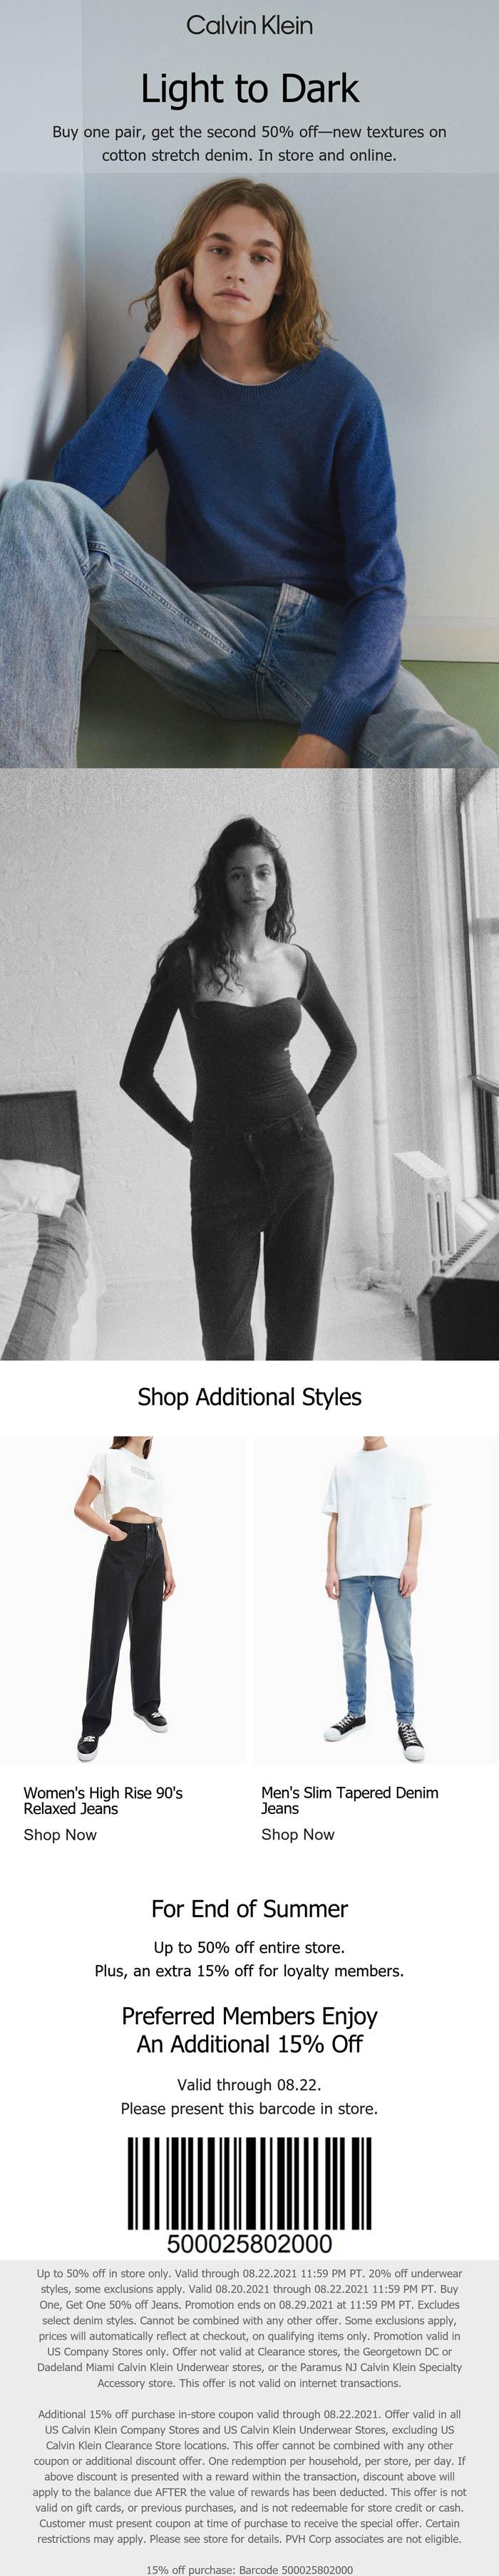 Calvin Klein stores Coupon  15-50% off & second denim 50% off at Calvin Klein, ditto online #calvinklein